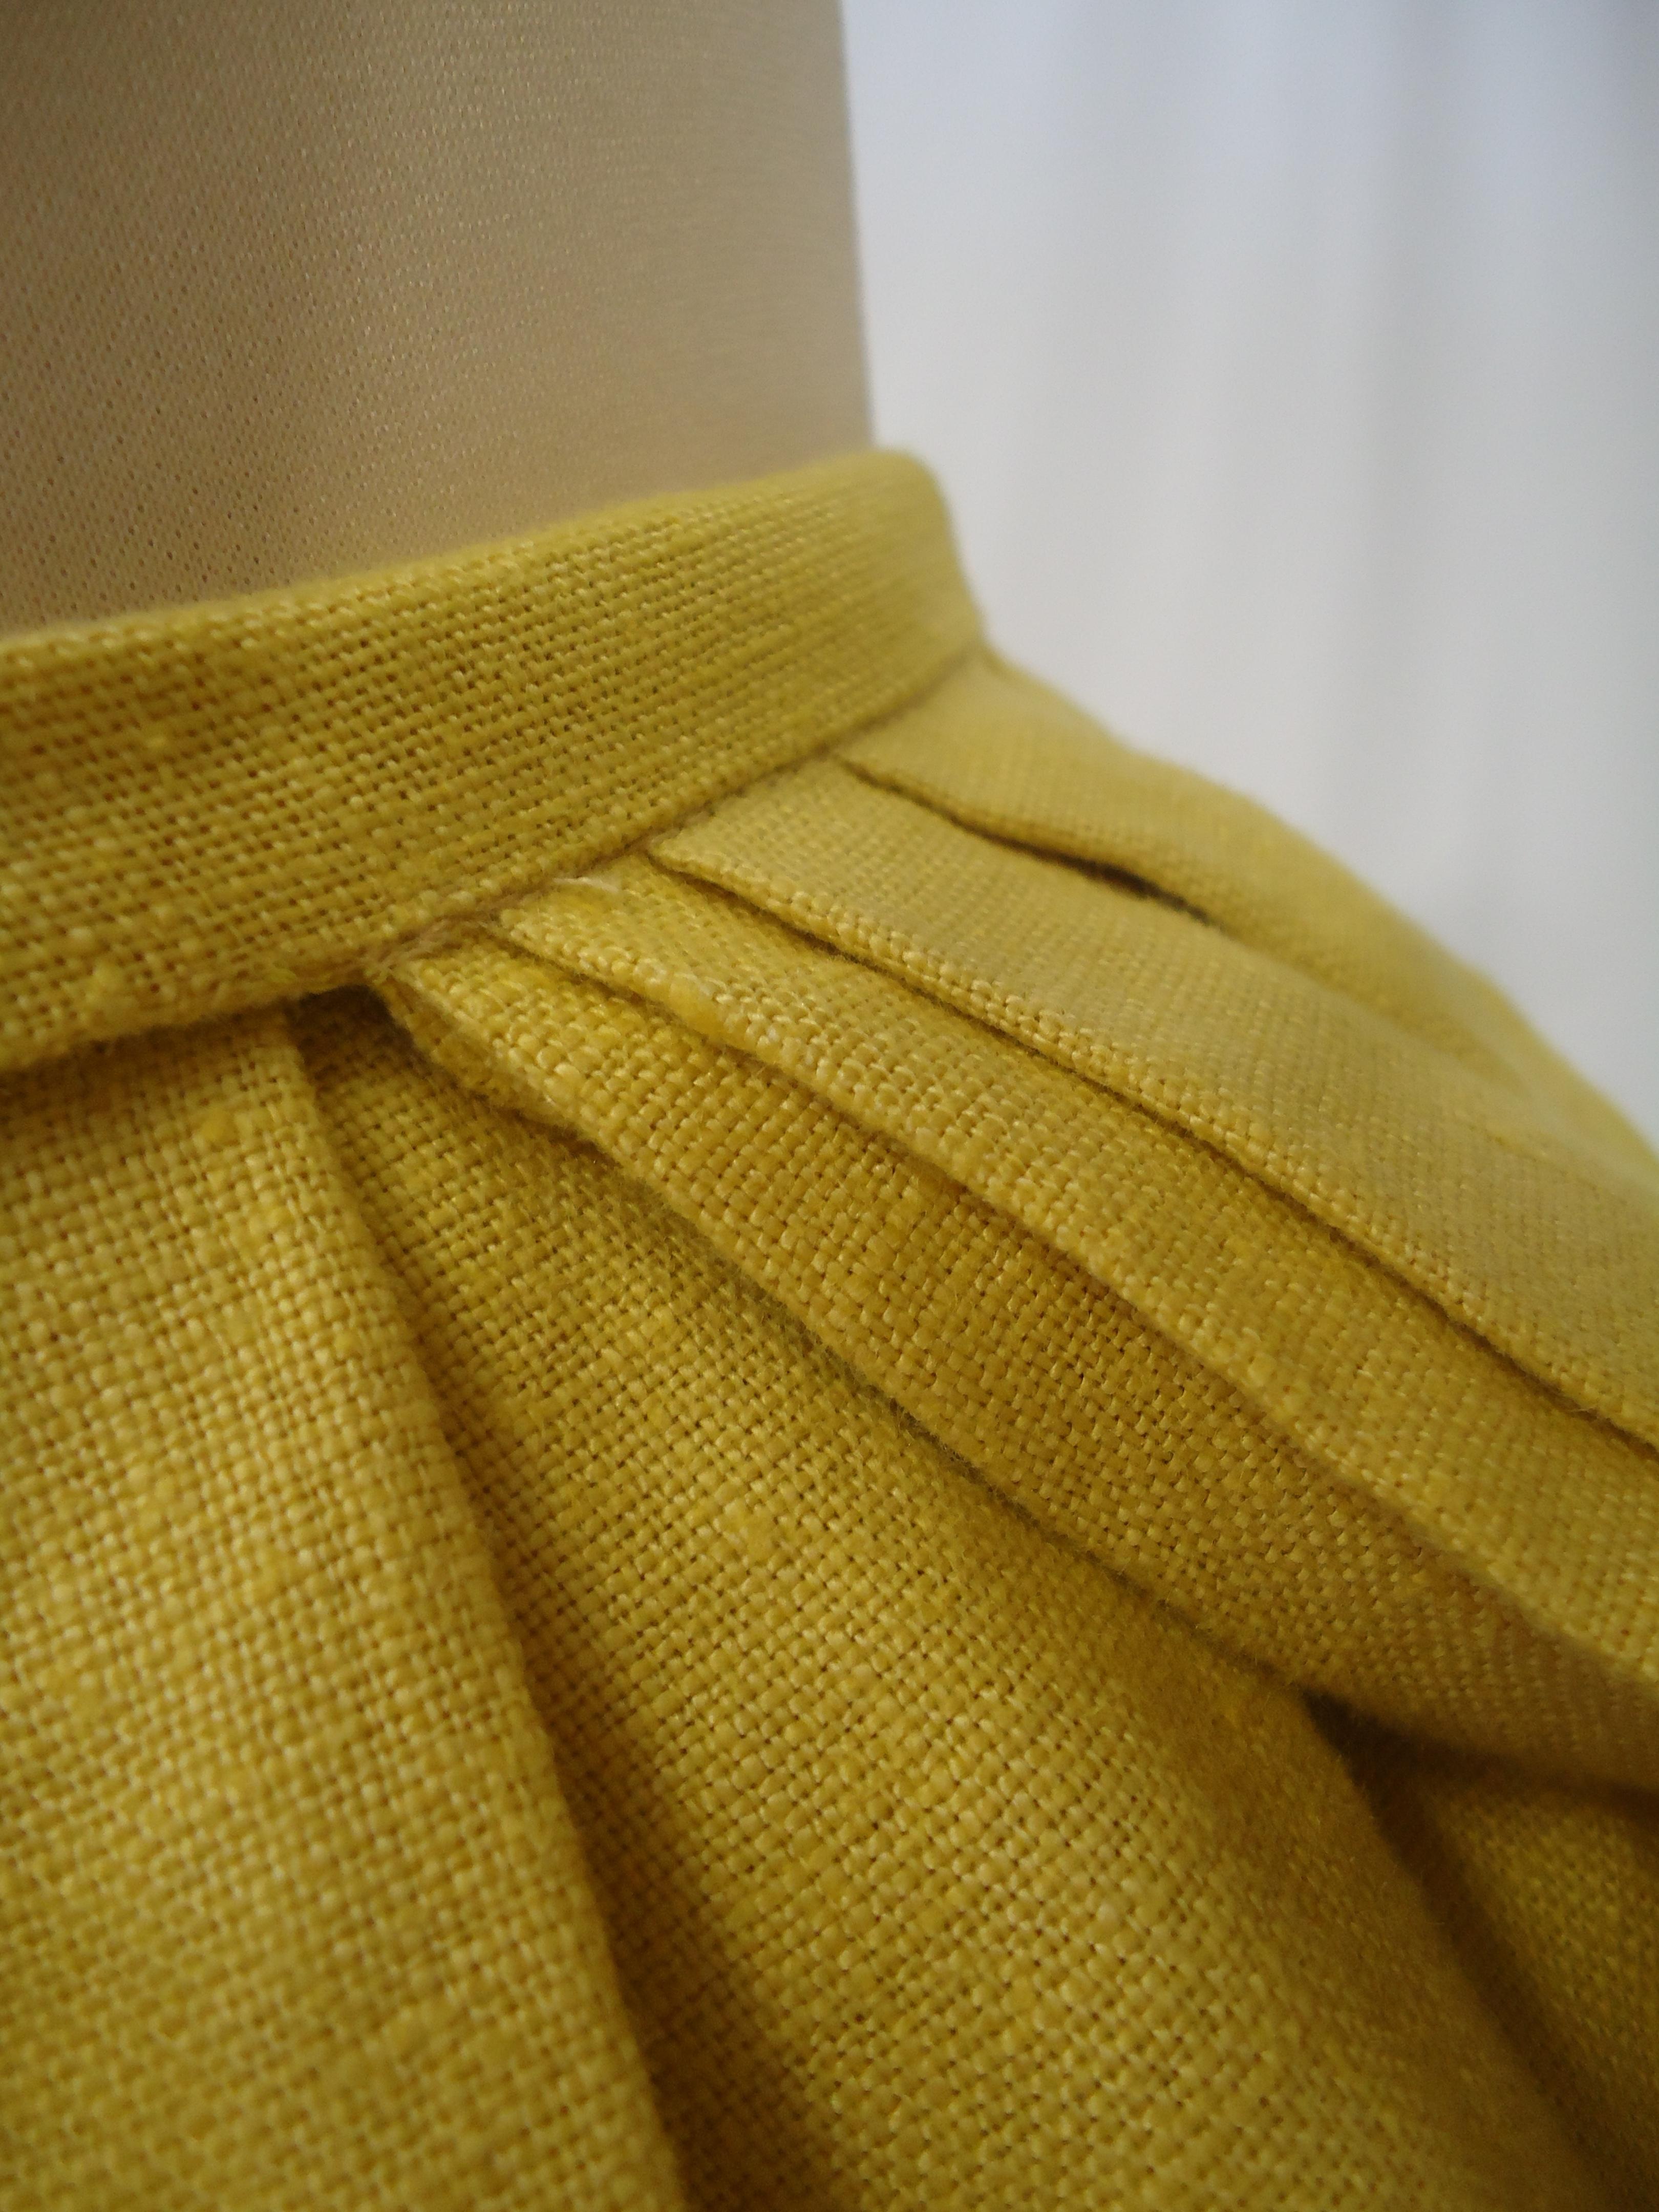 yellow sandby dress - 1750s - HandBound